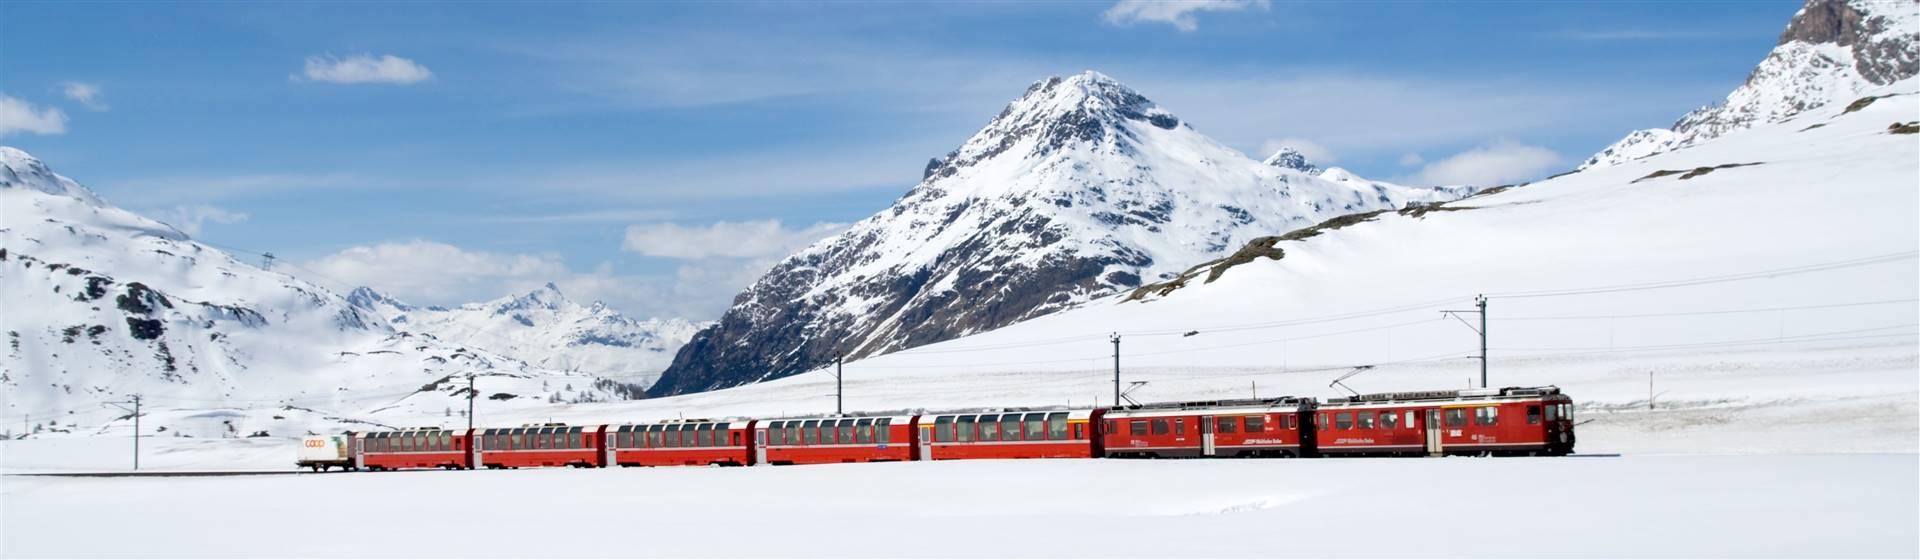 "<img src=""glacierexpress2-shutterstock.jpeg"" alt=""Glacier Express - Switzerland""/>"